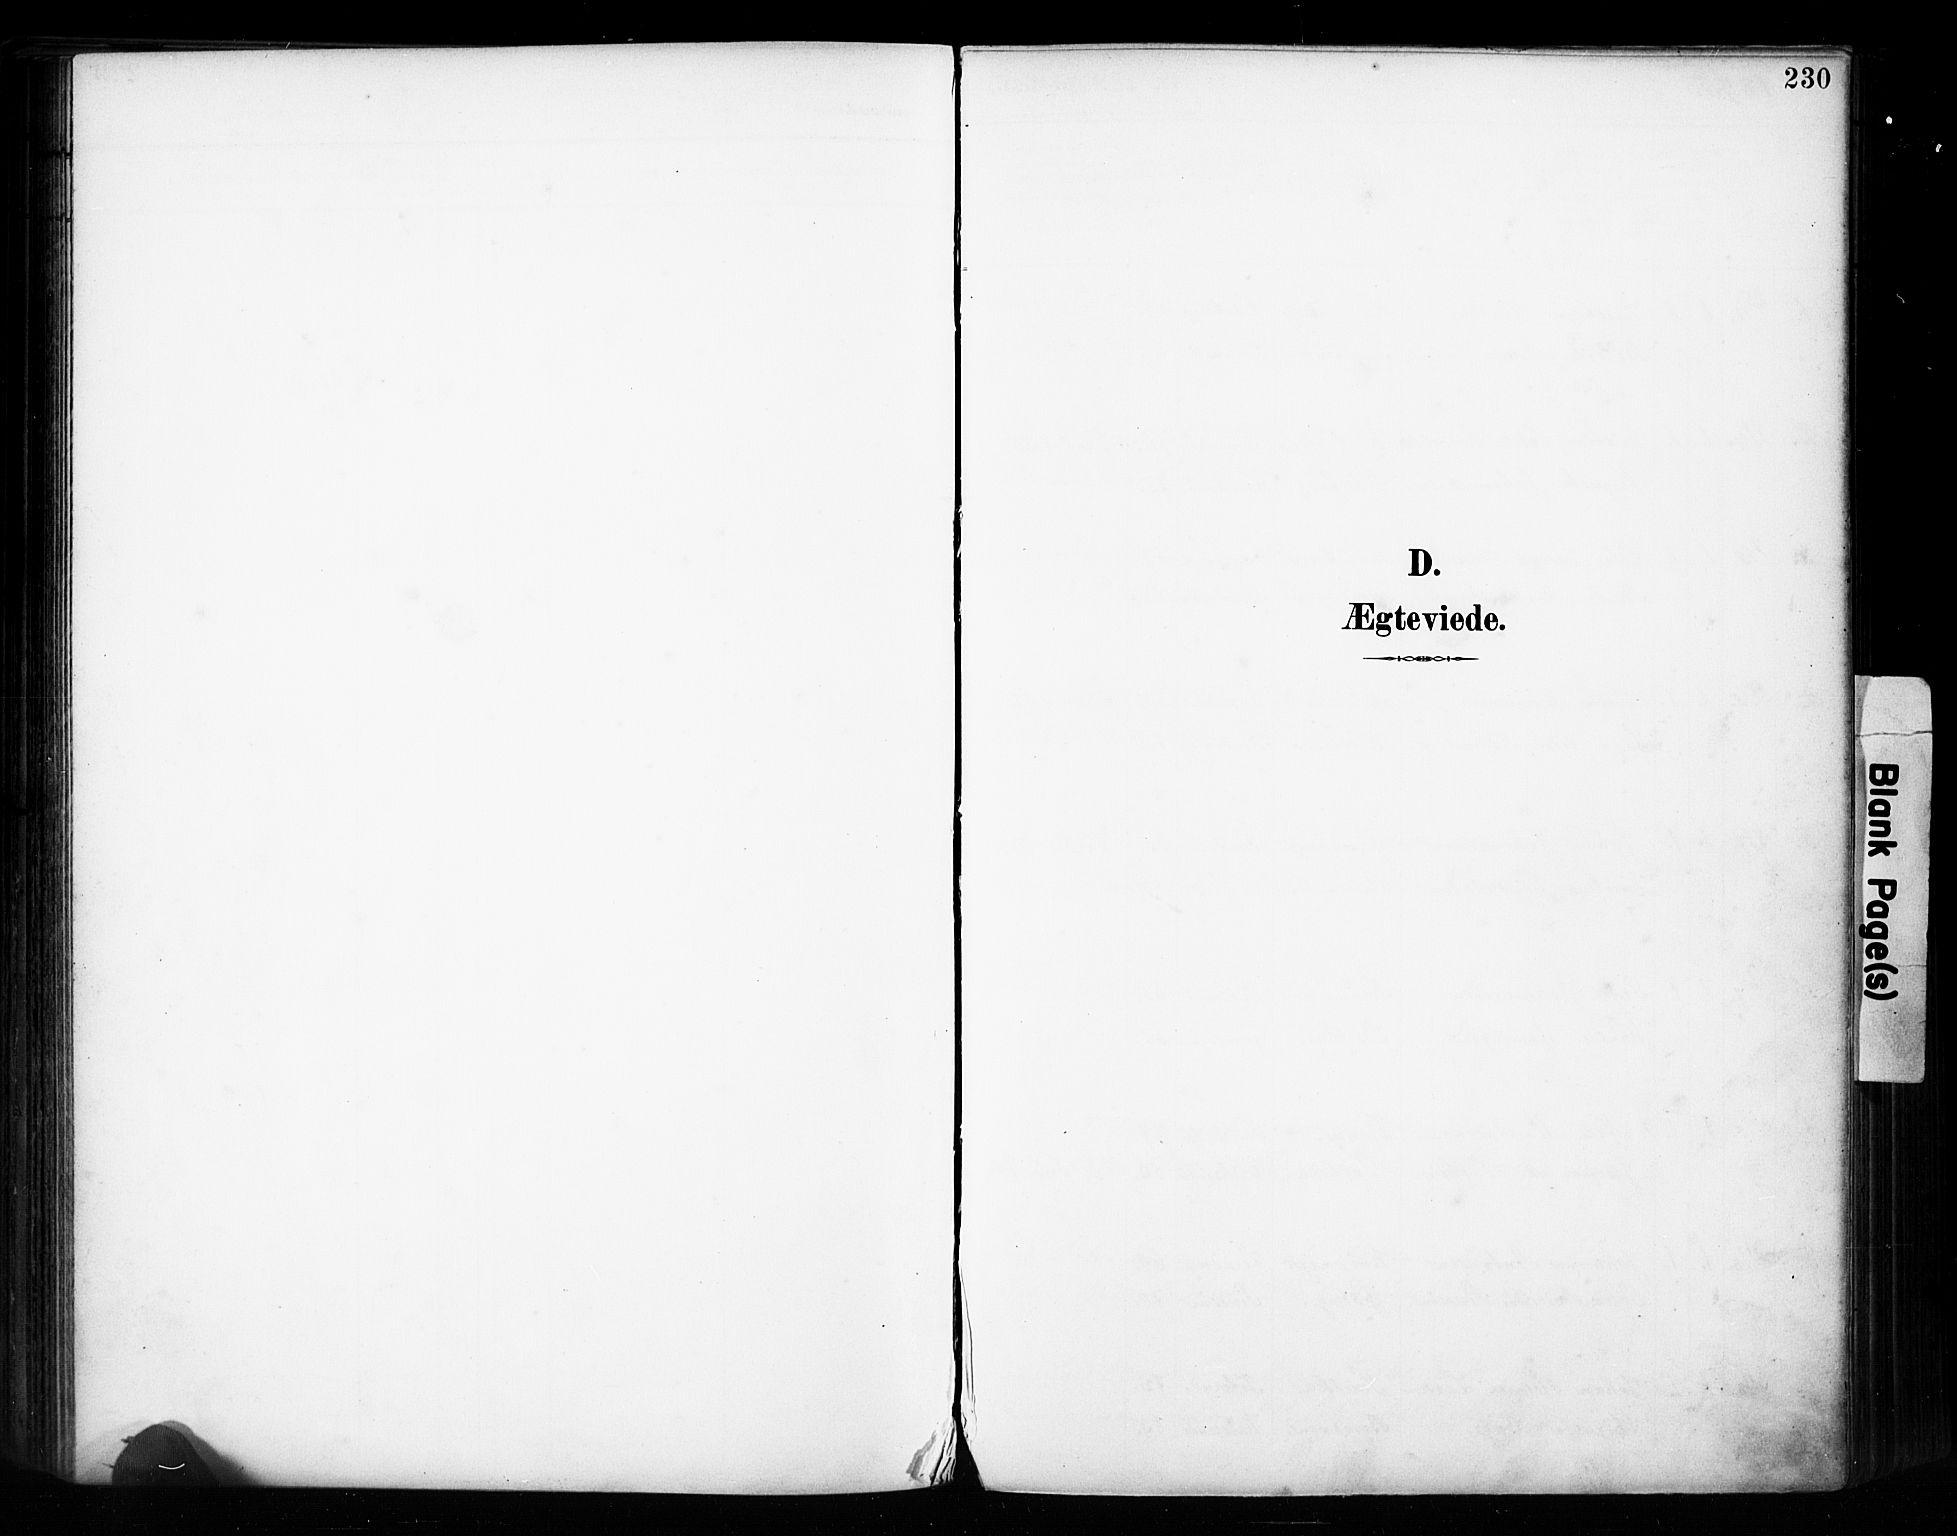 SAH, Vestre Toten prestekontor, H/Ha/Haa/L0011: Ministerialbok nr. 11, 1895-1906, s. 230